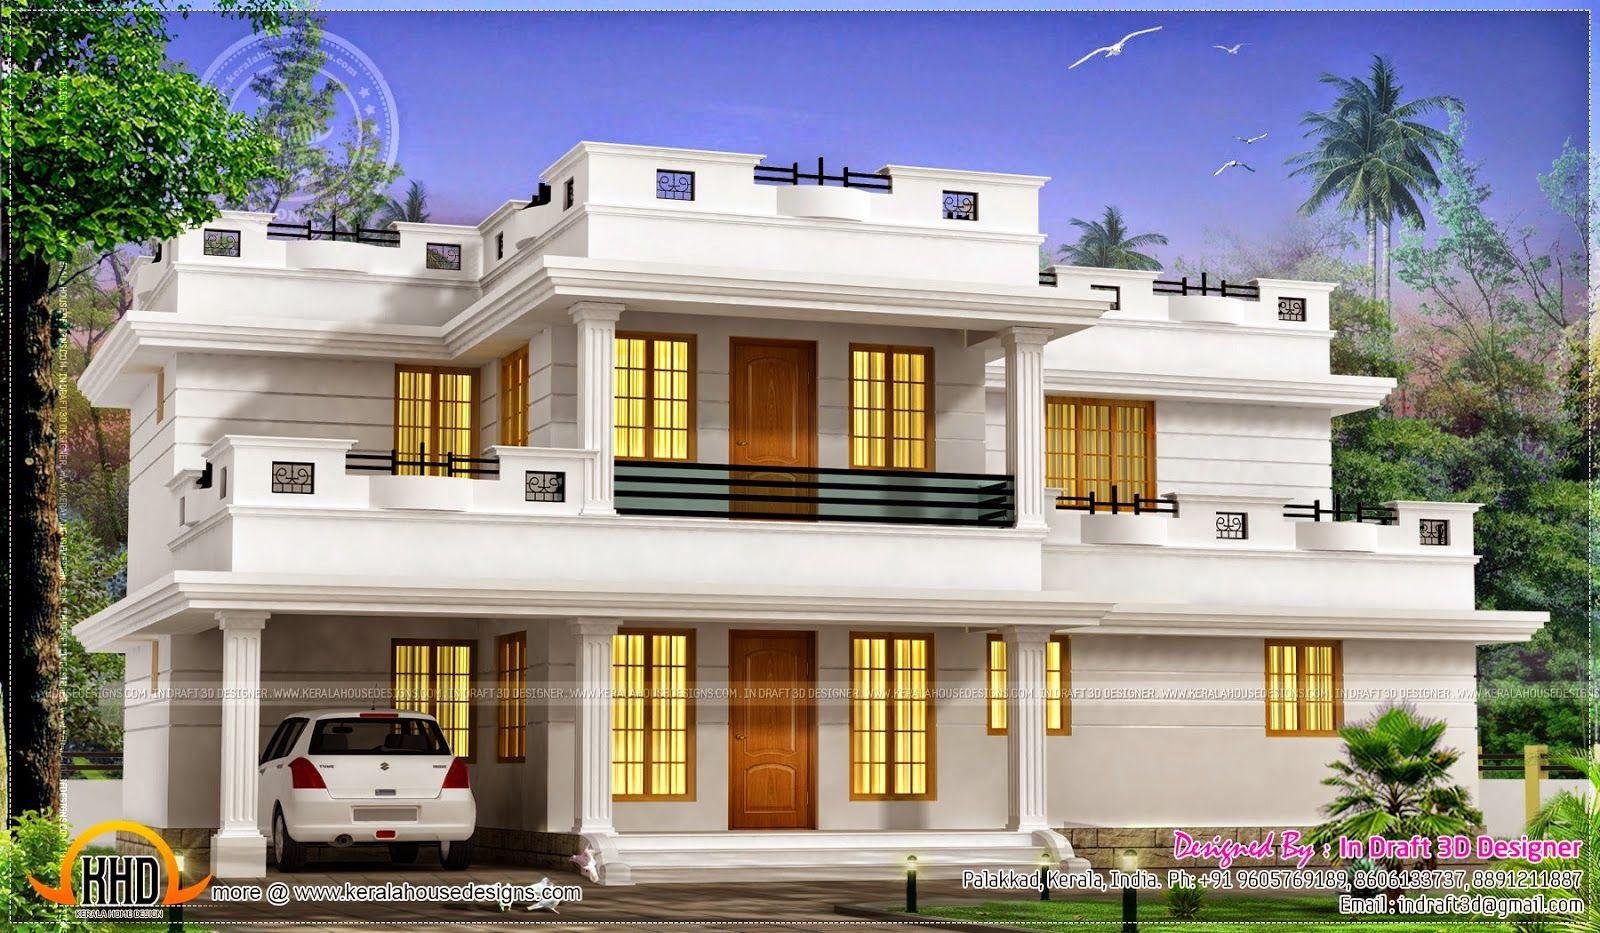 Desain Rumah Minimalis Atap Datar Klik Rumahku Istanaku